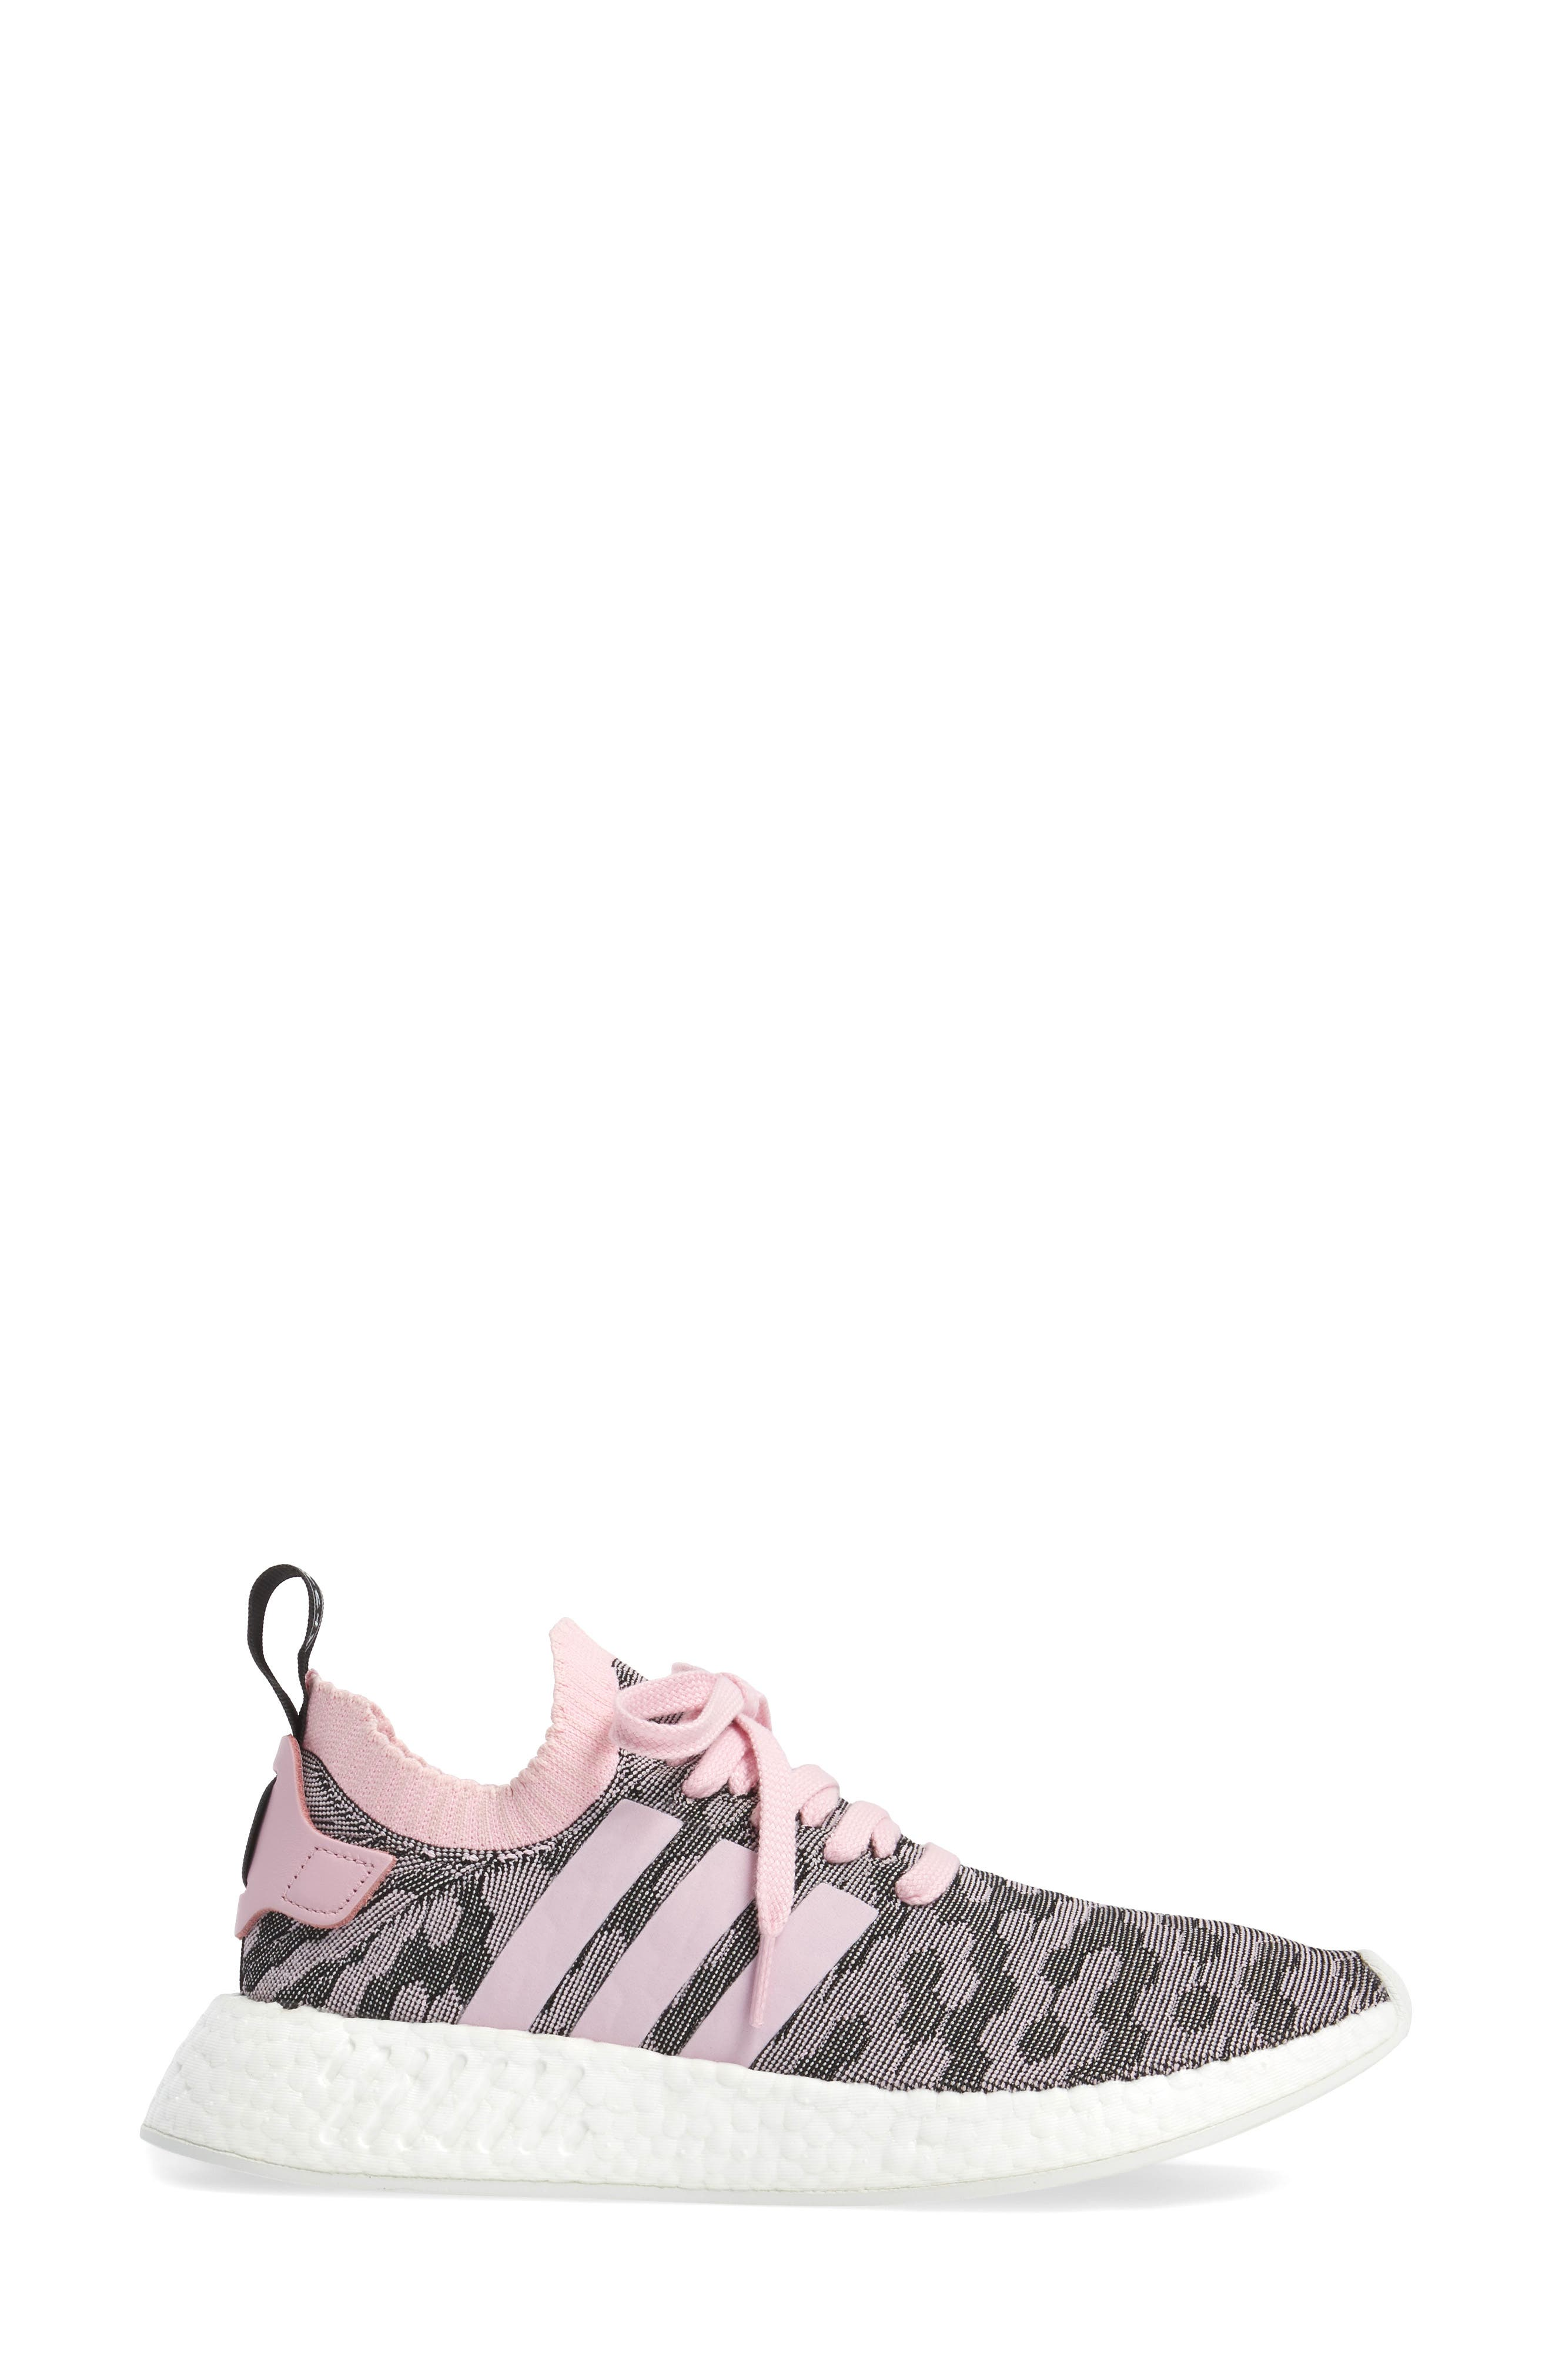 NMD R2 Primeknit Athletic Shoe,                             Alternate thumbnail 3, color,                             Wonder Pink/ Wonder Pink